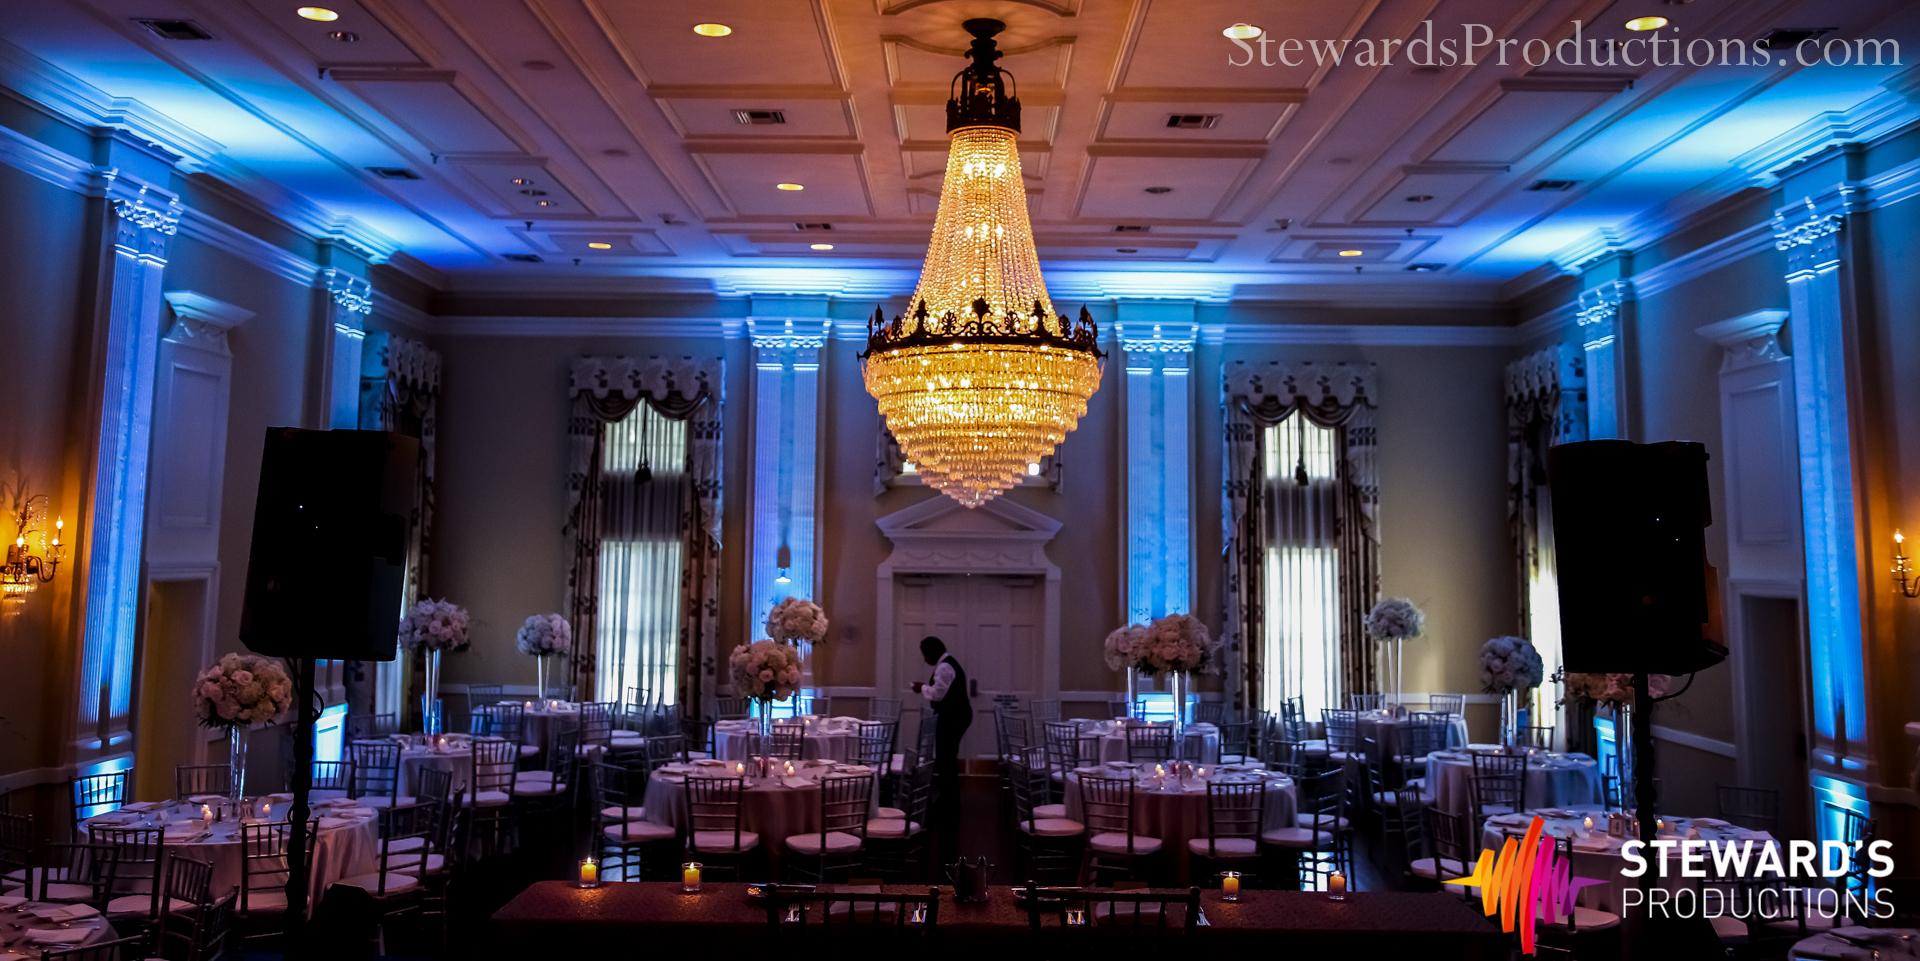 Wireless LED Up Lighting! & LED Up Lighting | Dallas Wedding DJ: Stewardu0027s Productions Dallas ... azcodes.com